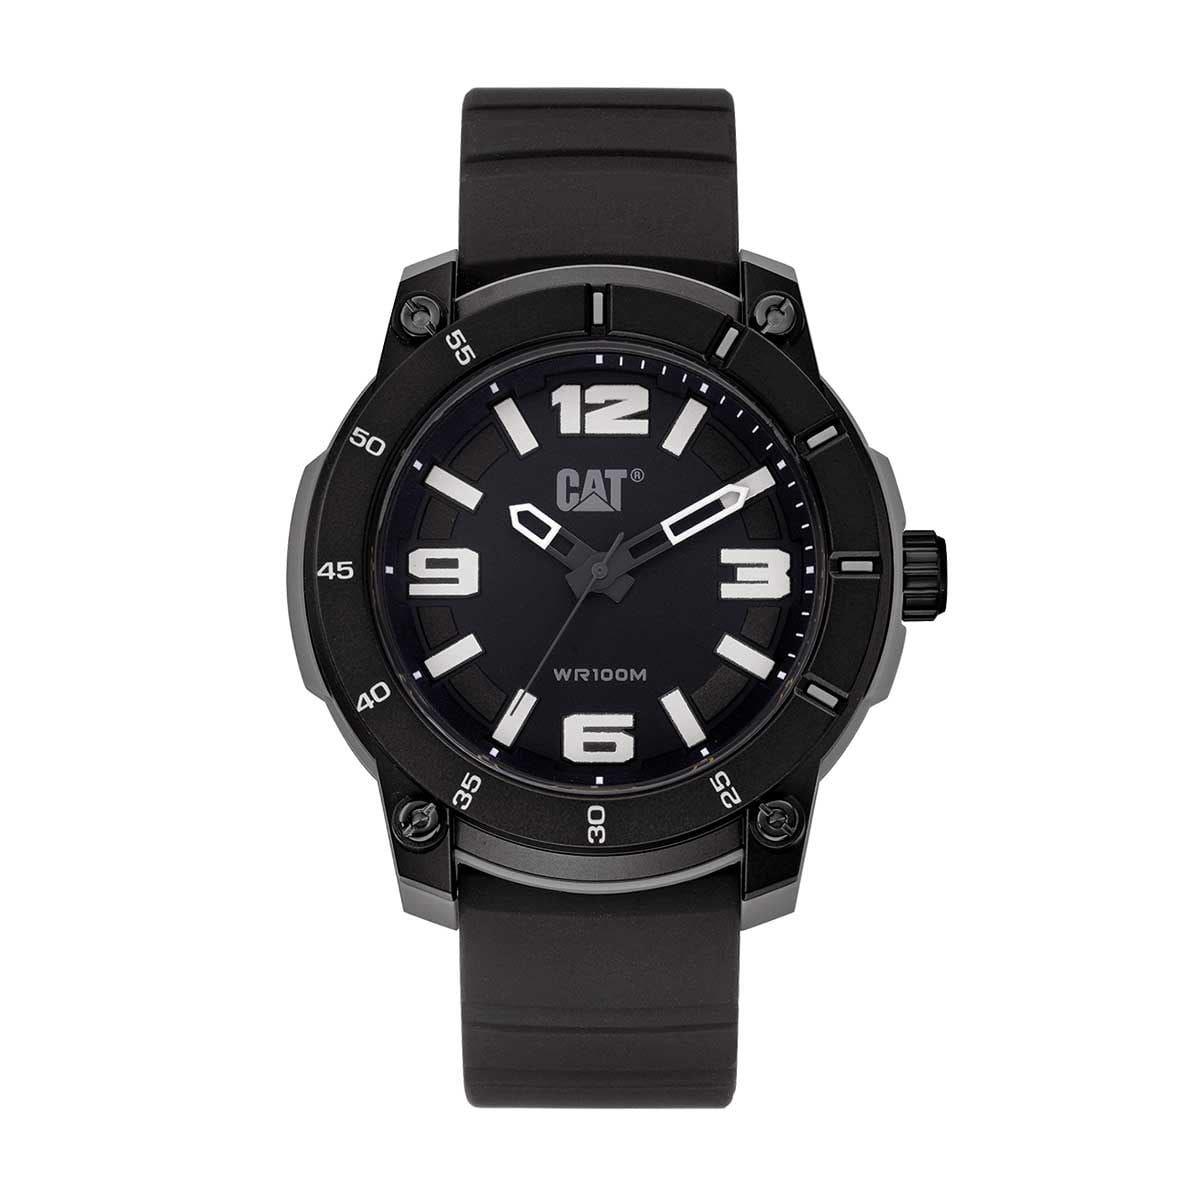 Reloj Caterpillar LG14021122 Para Caballero